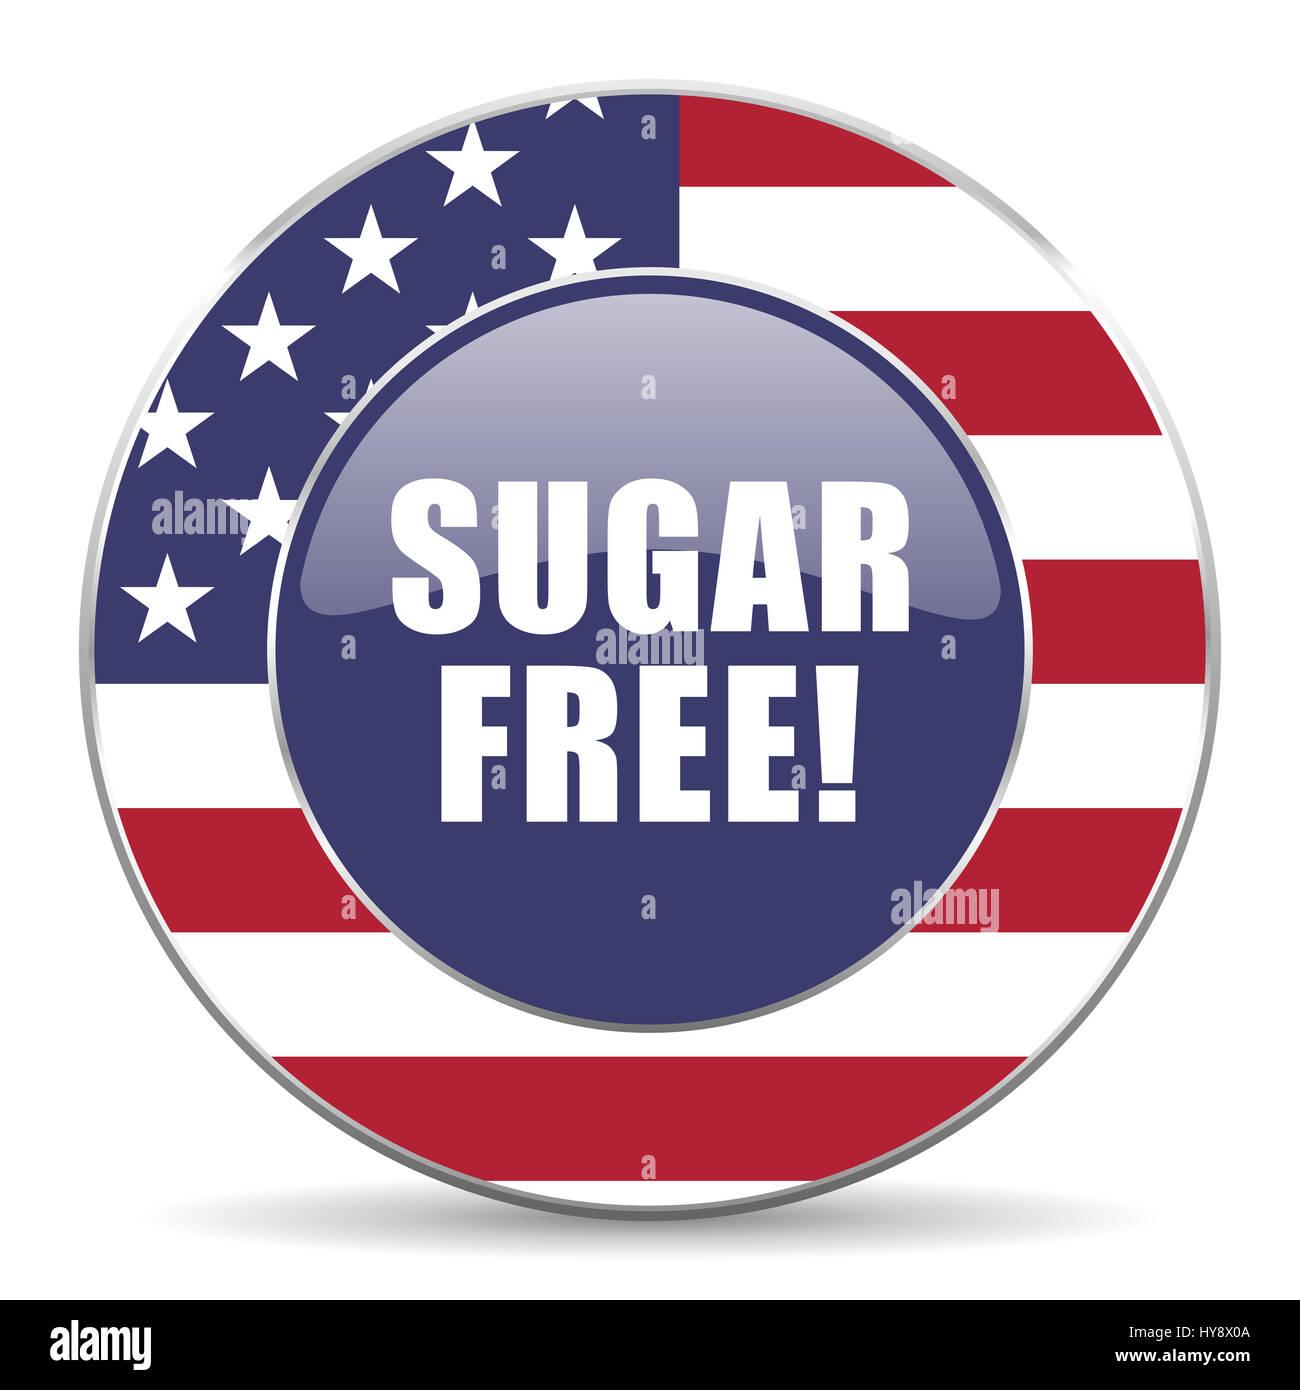 Sugar free usa design web american round internet icon with shadow on white background. Stock Photo